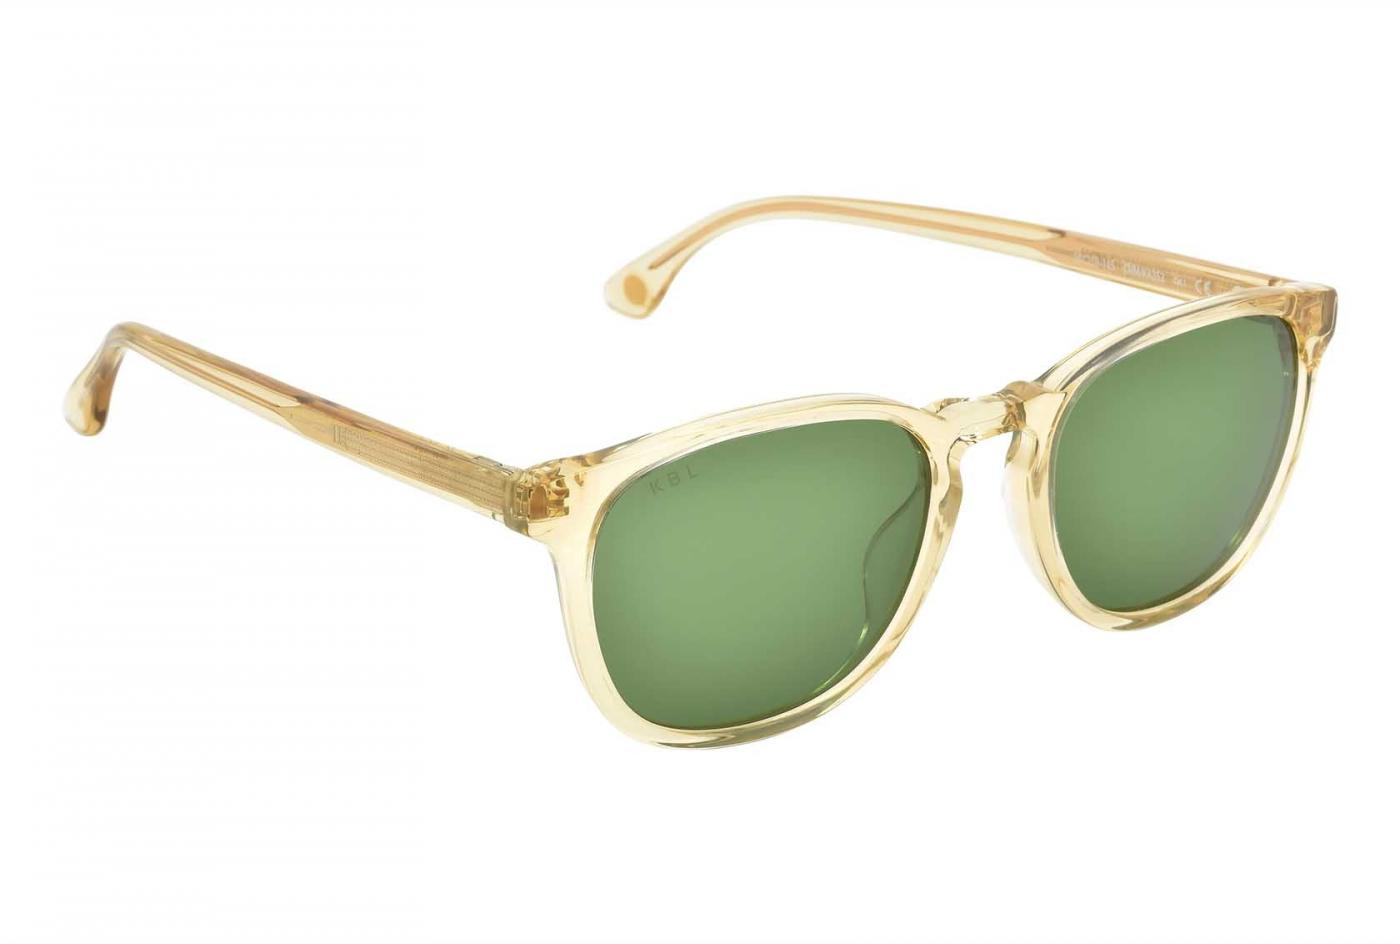 kbl eyewear – Kbl wish list - wish list- ka353 størrelse 50 fra brodersen + kobborg